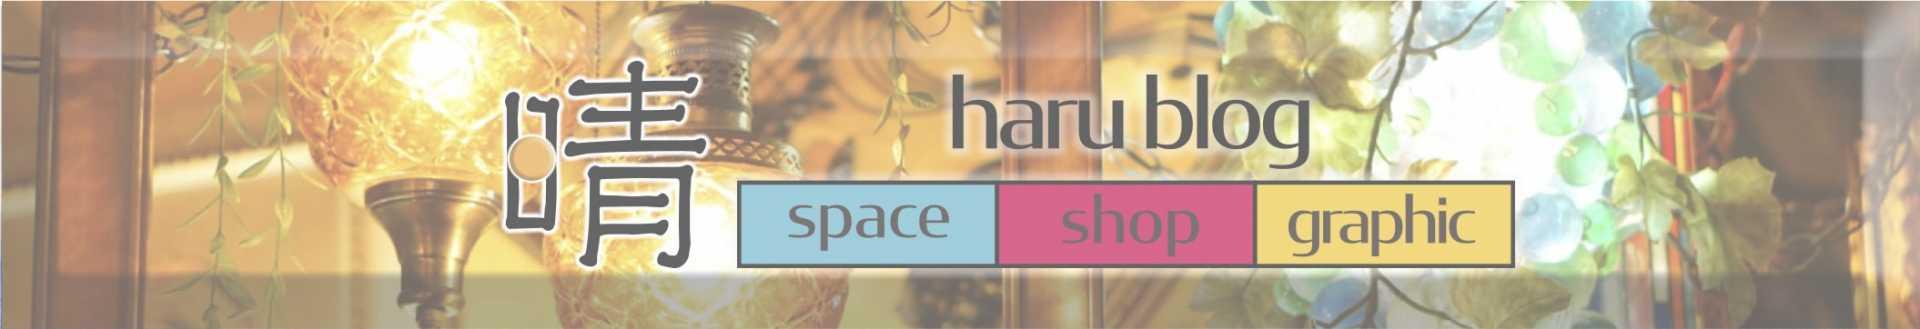 haru blog